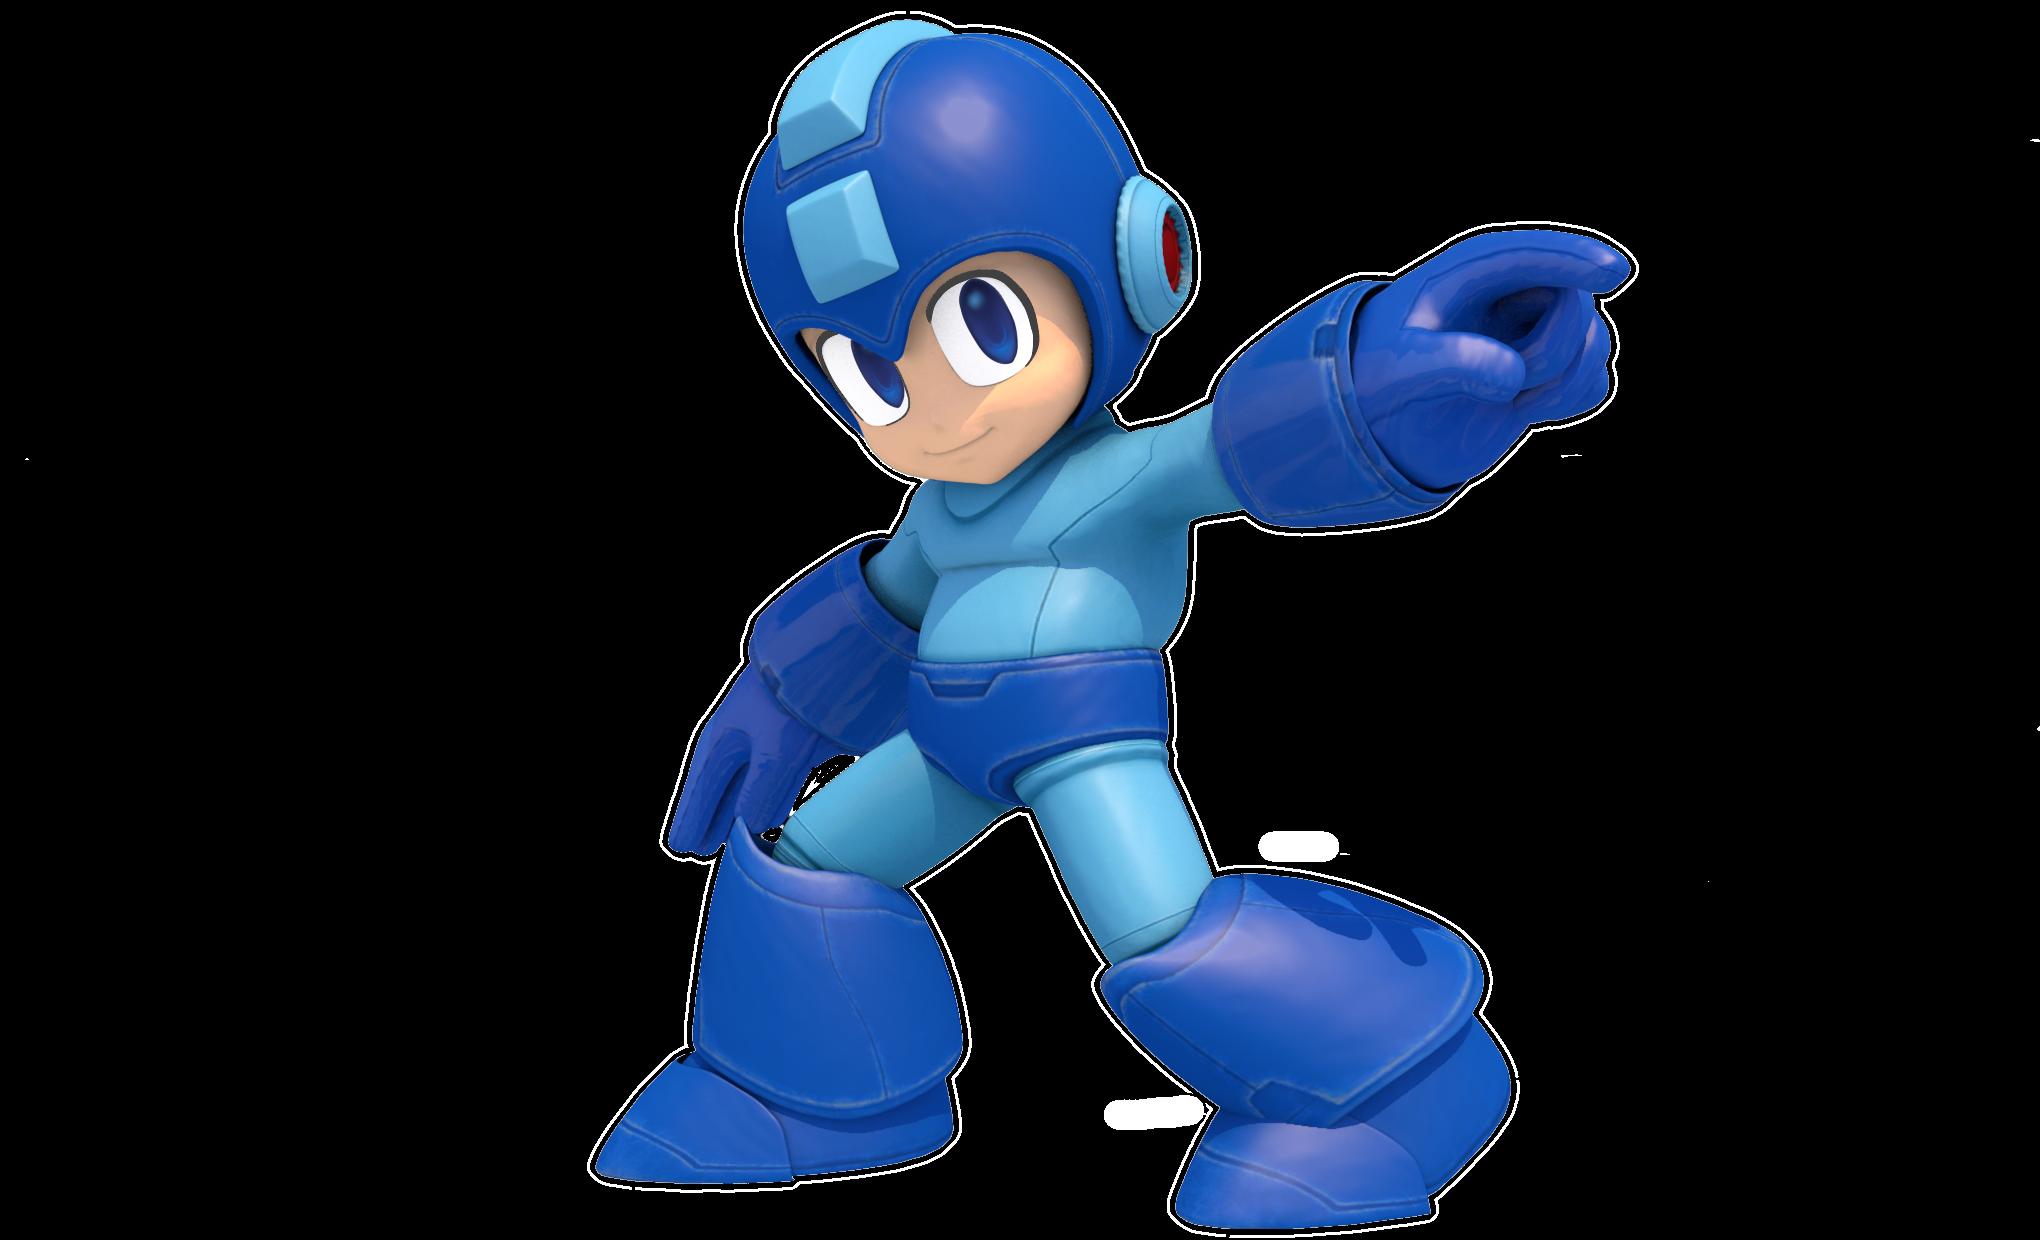 Mega Man Download PNG Image - Megaman PNG